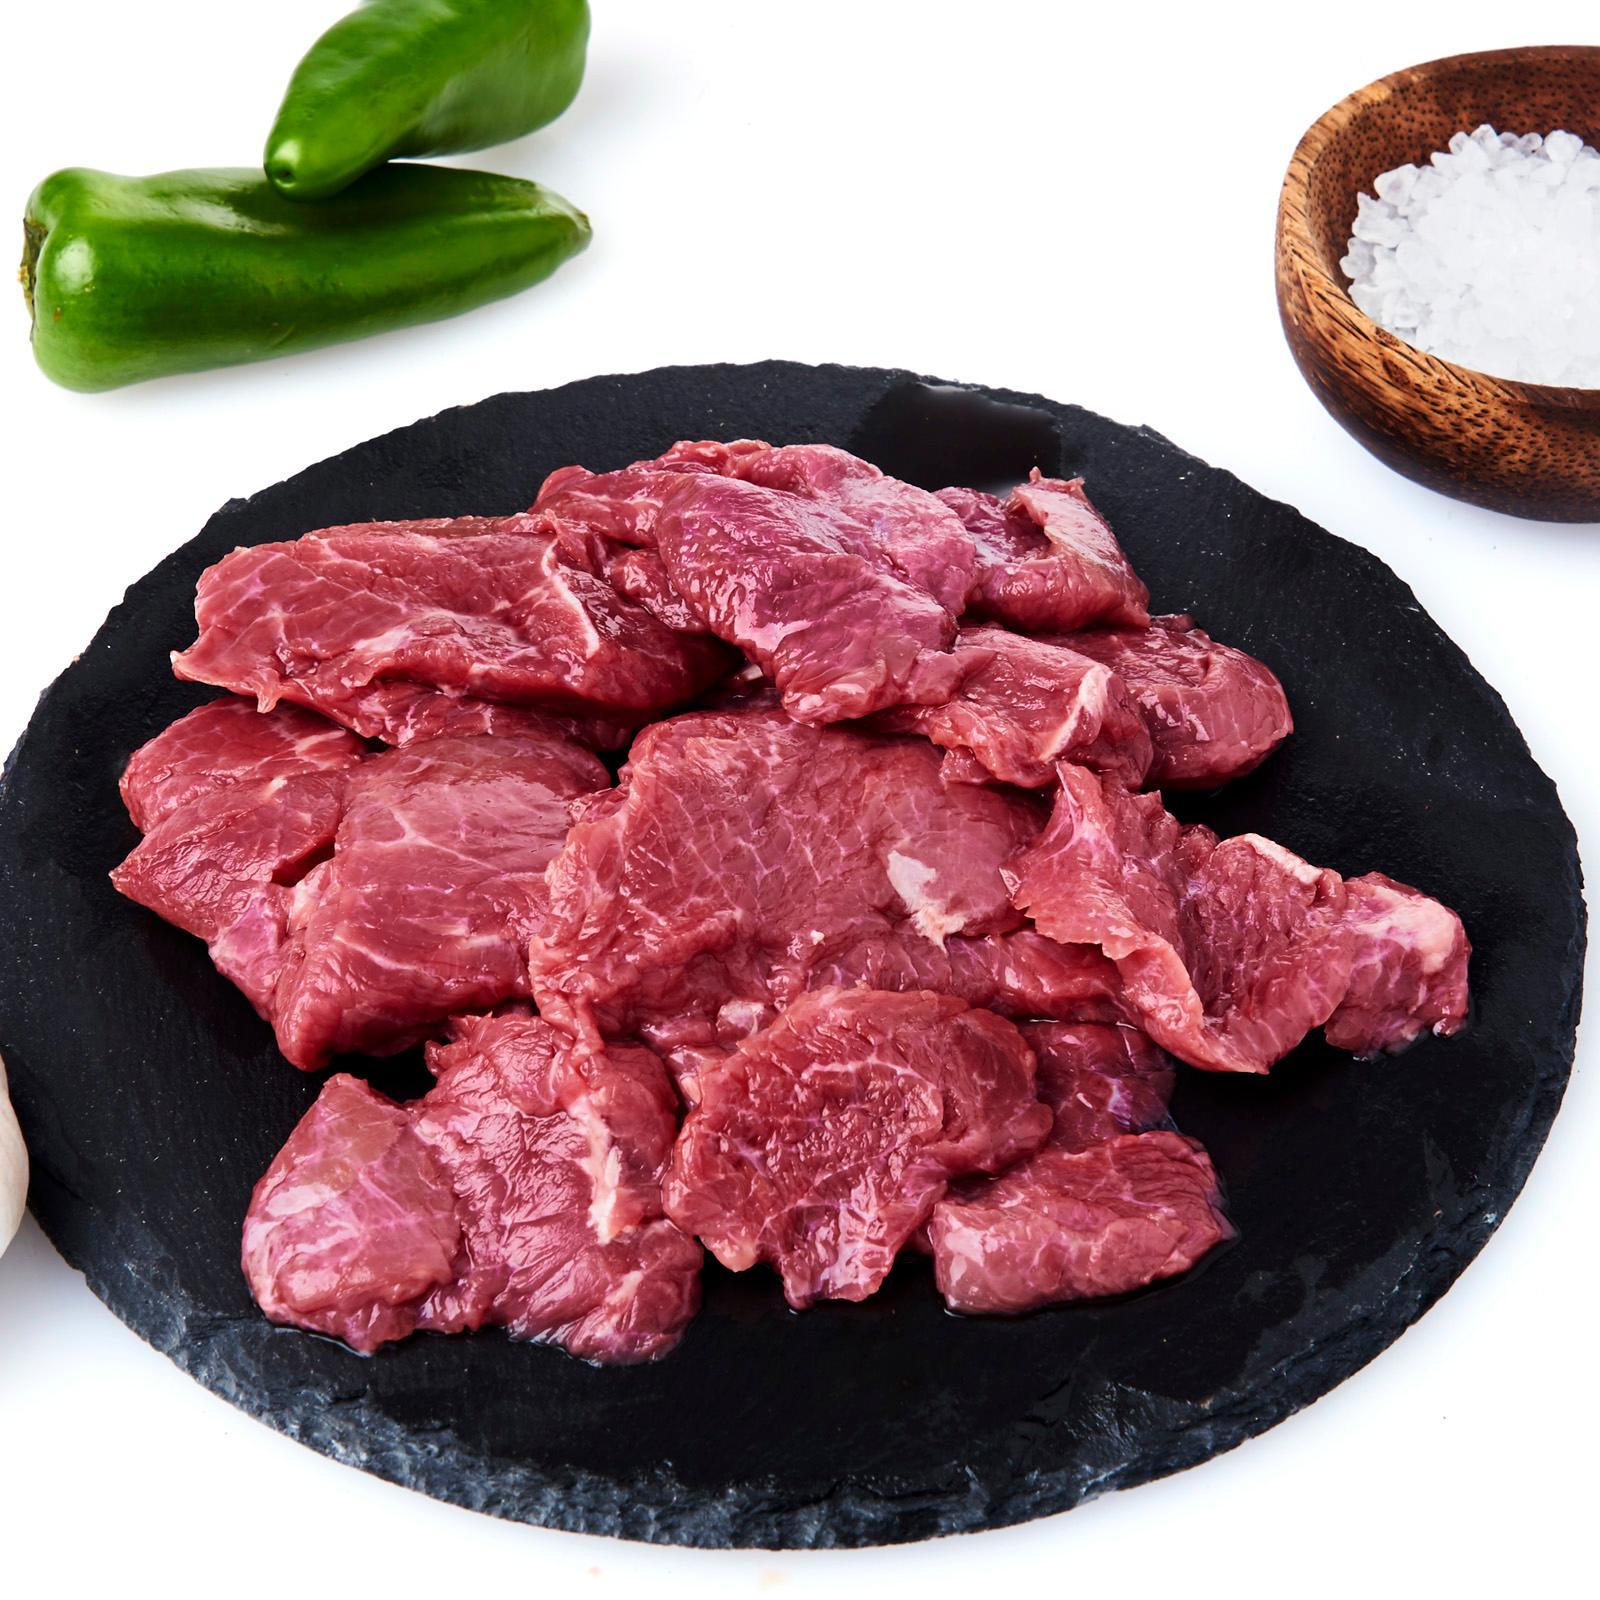 Meat Co. Pasture Fed Australian Beef Stir Fry